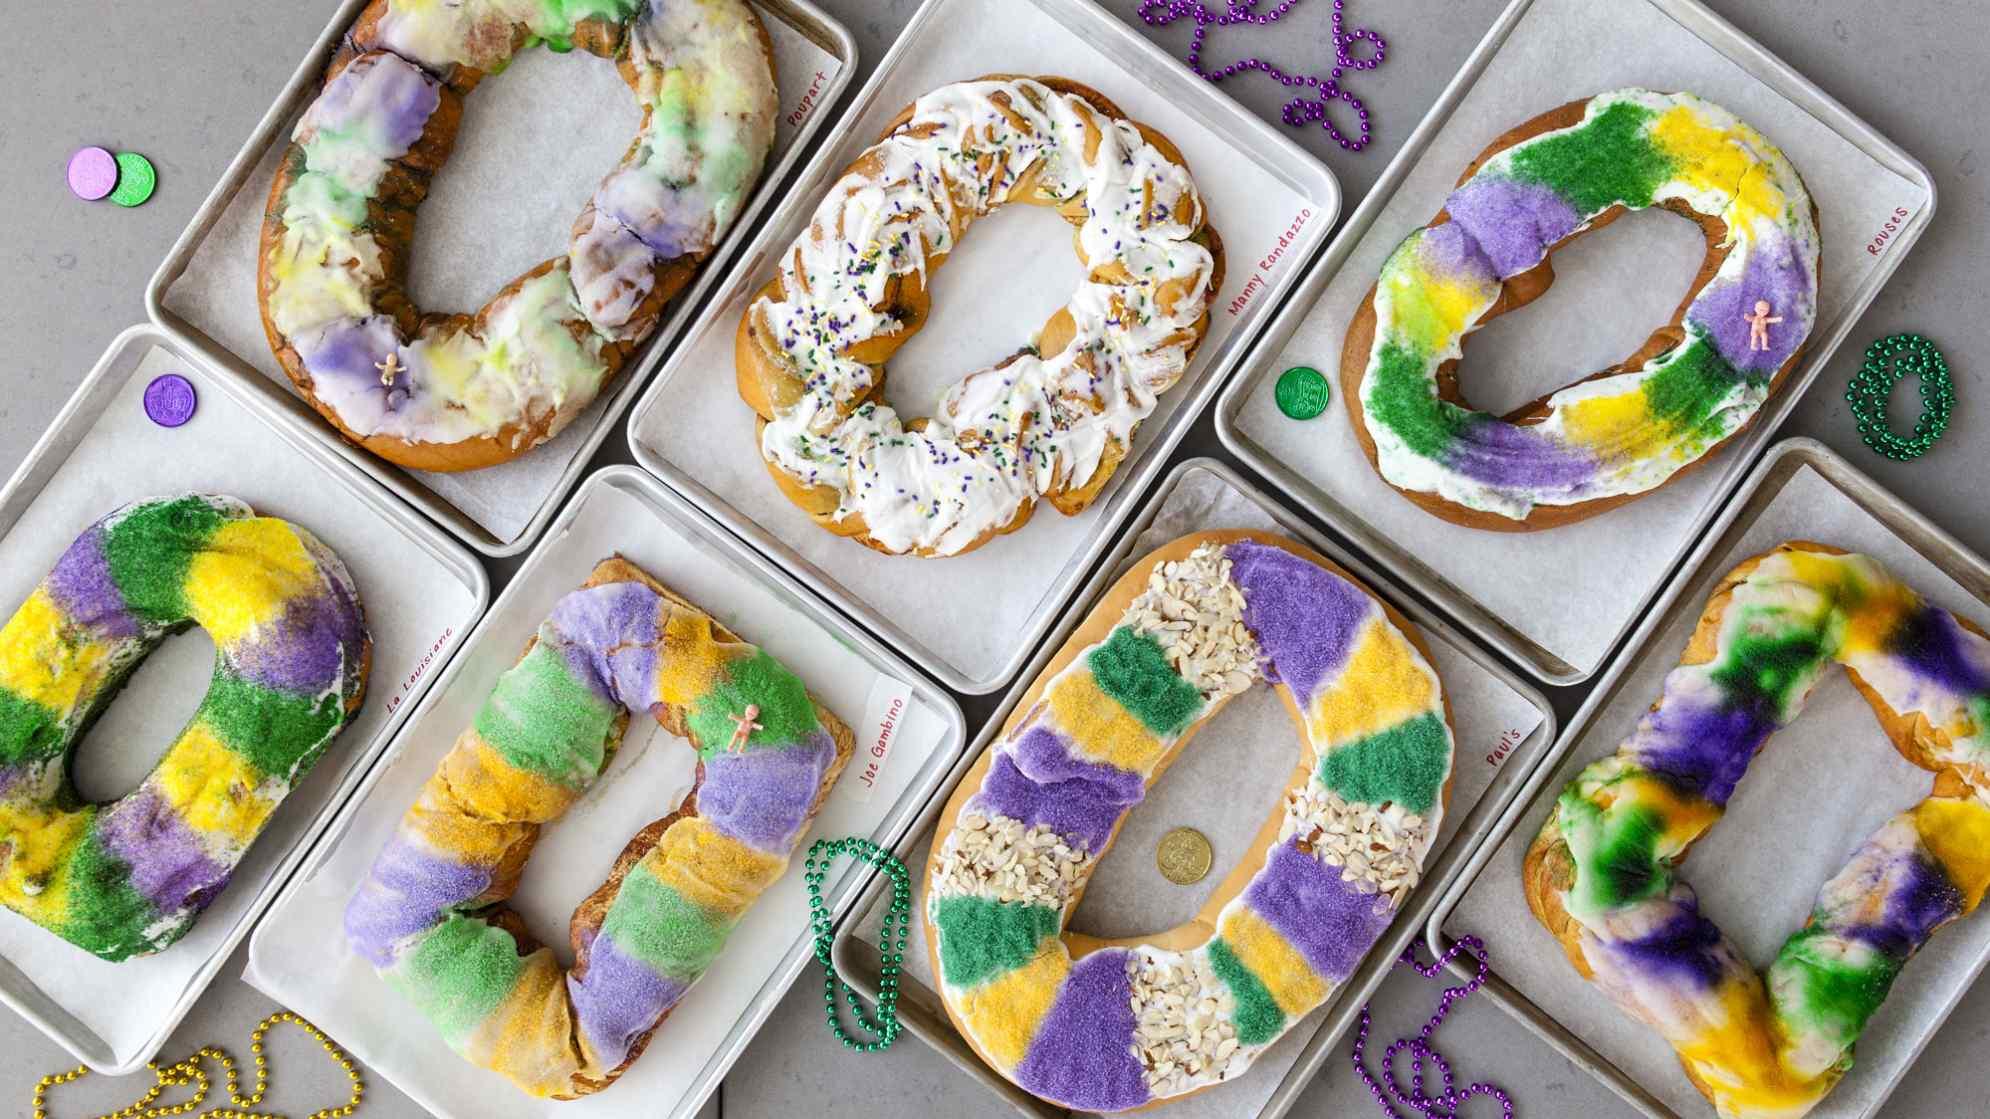 Tasting MailOrder King Cakes